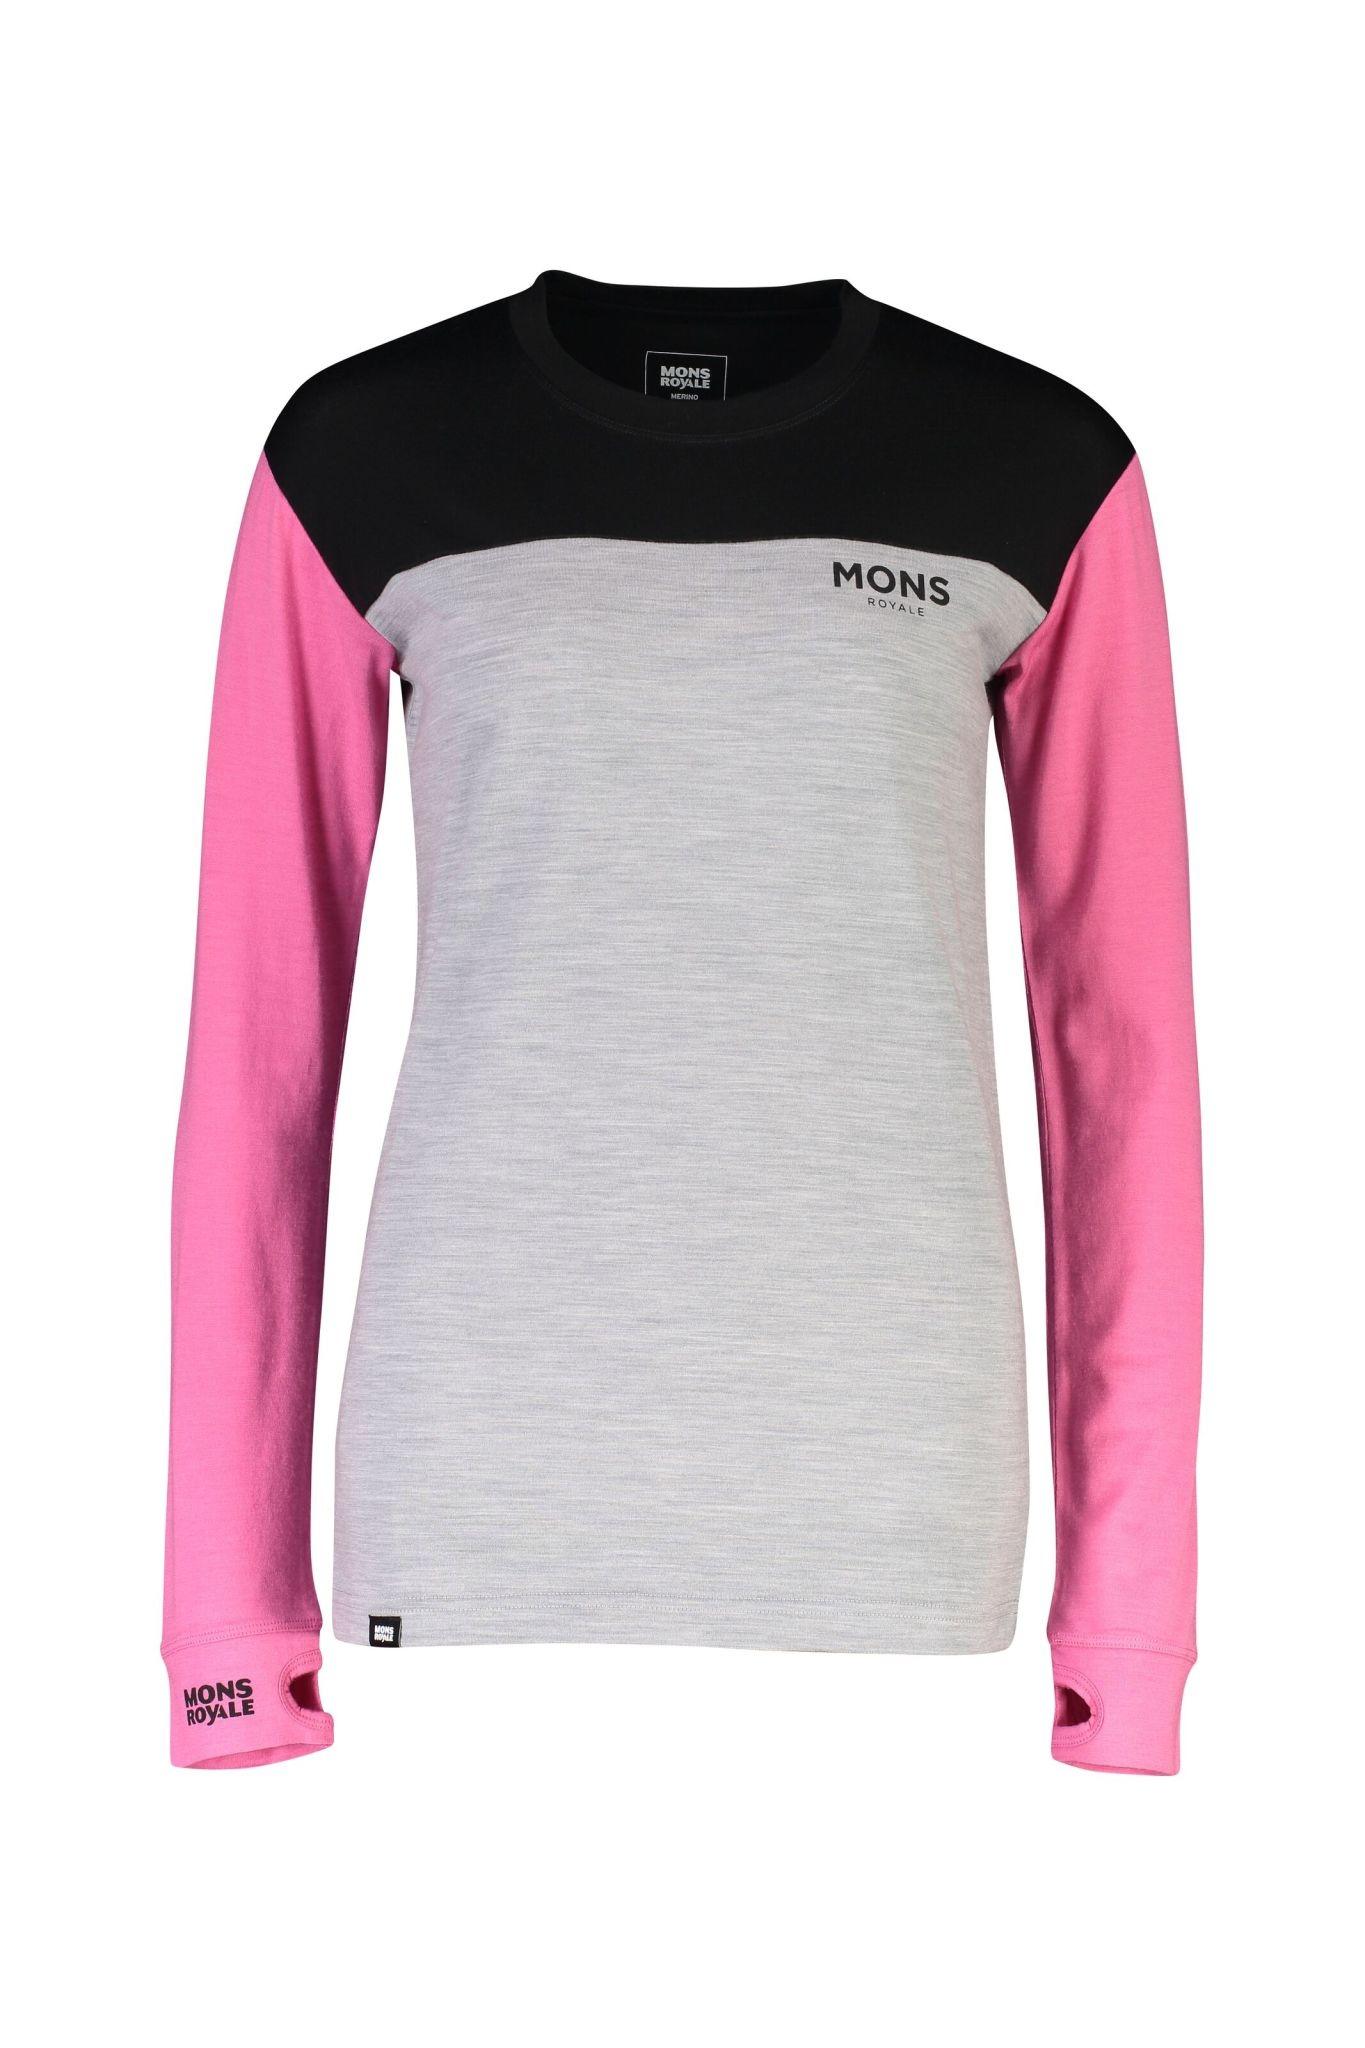 MONS ROYALE Mons Royale Women's Yotei BF Tech LS Shirt